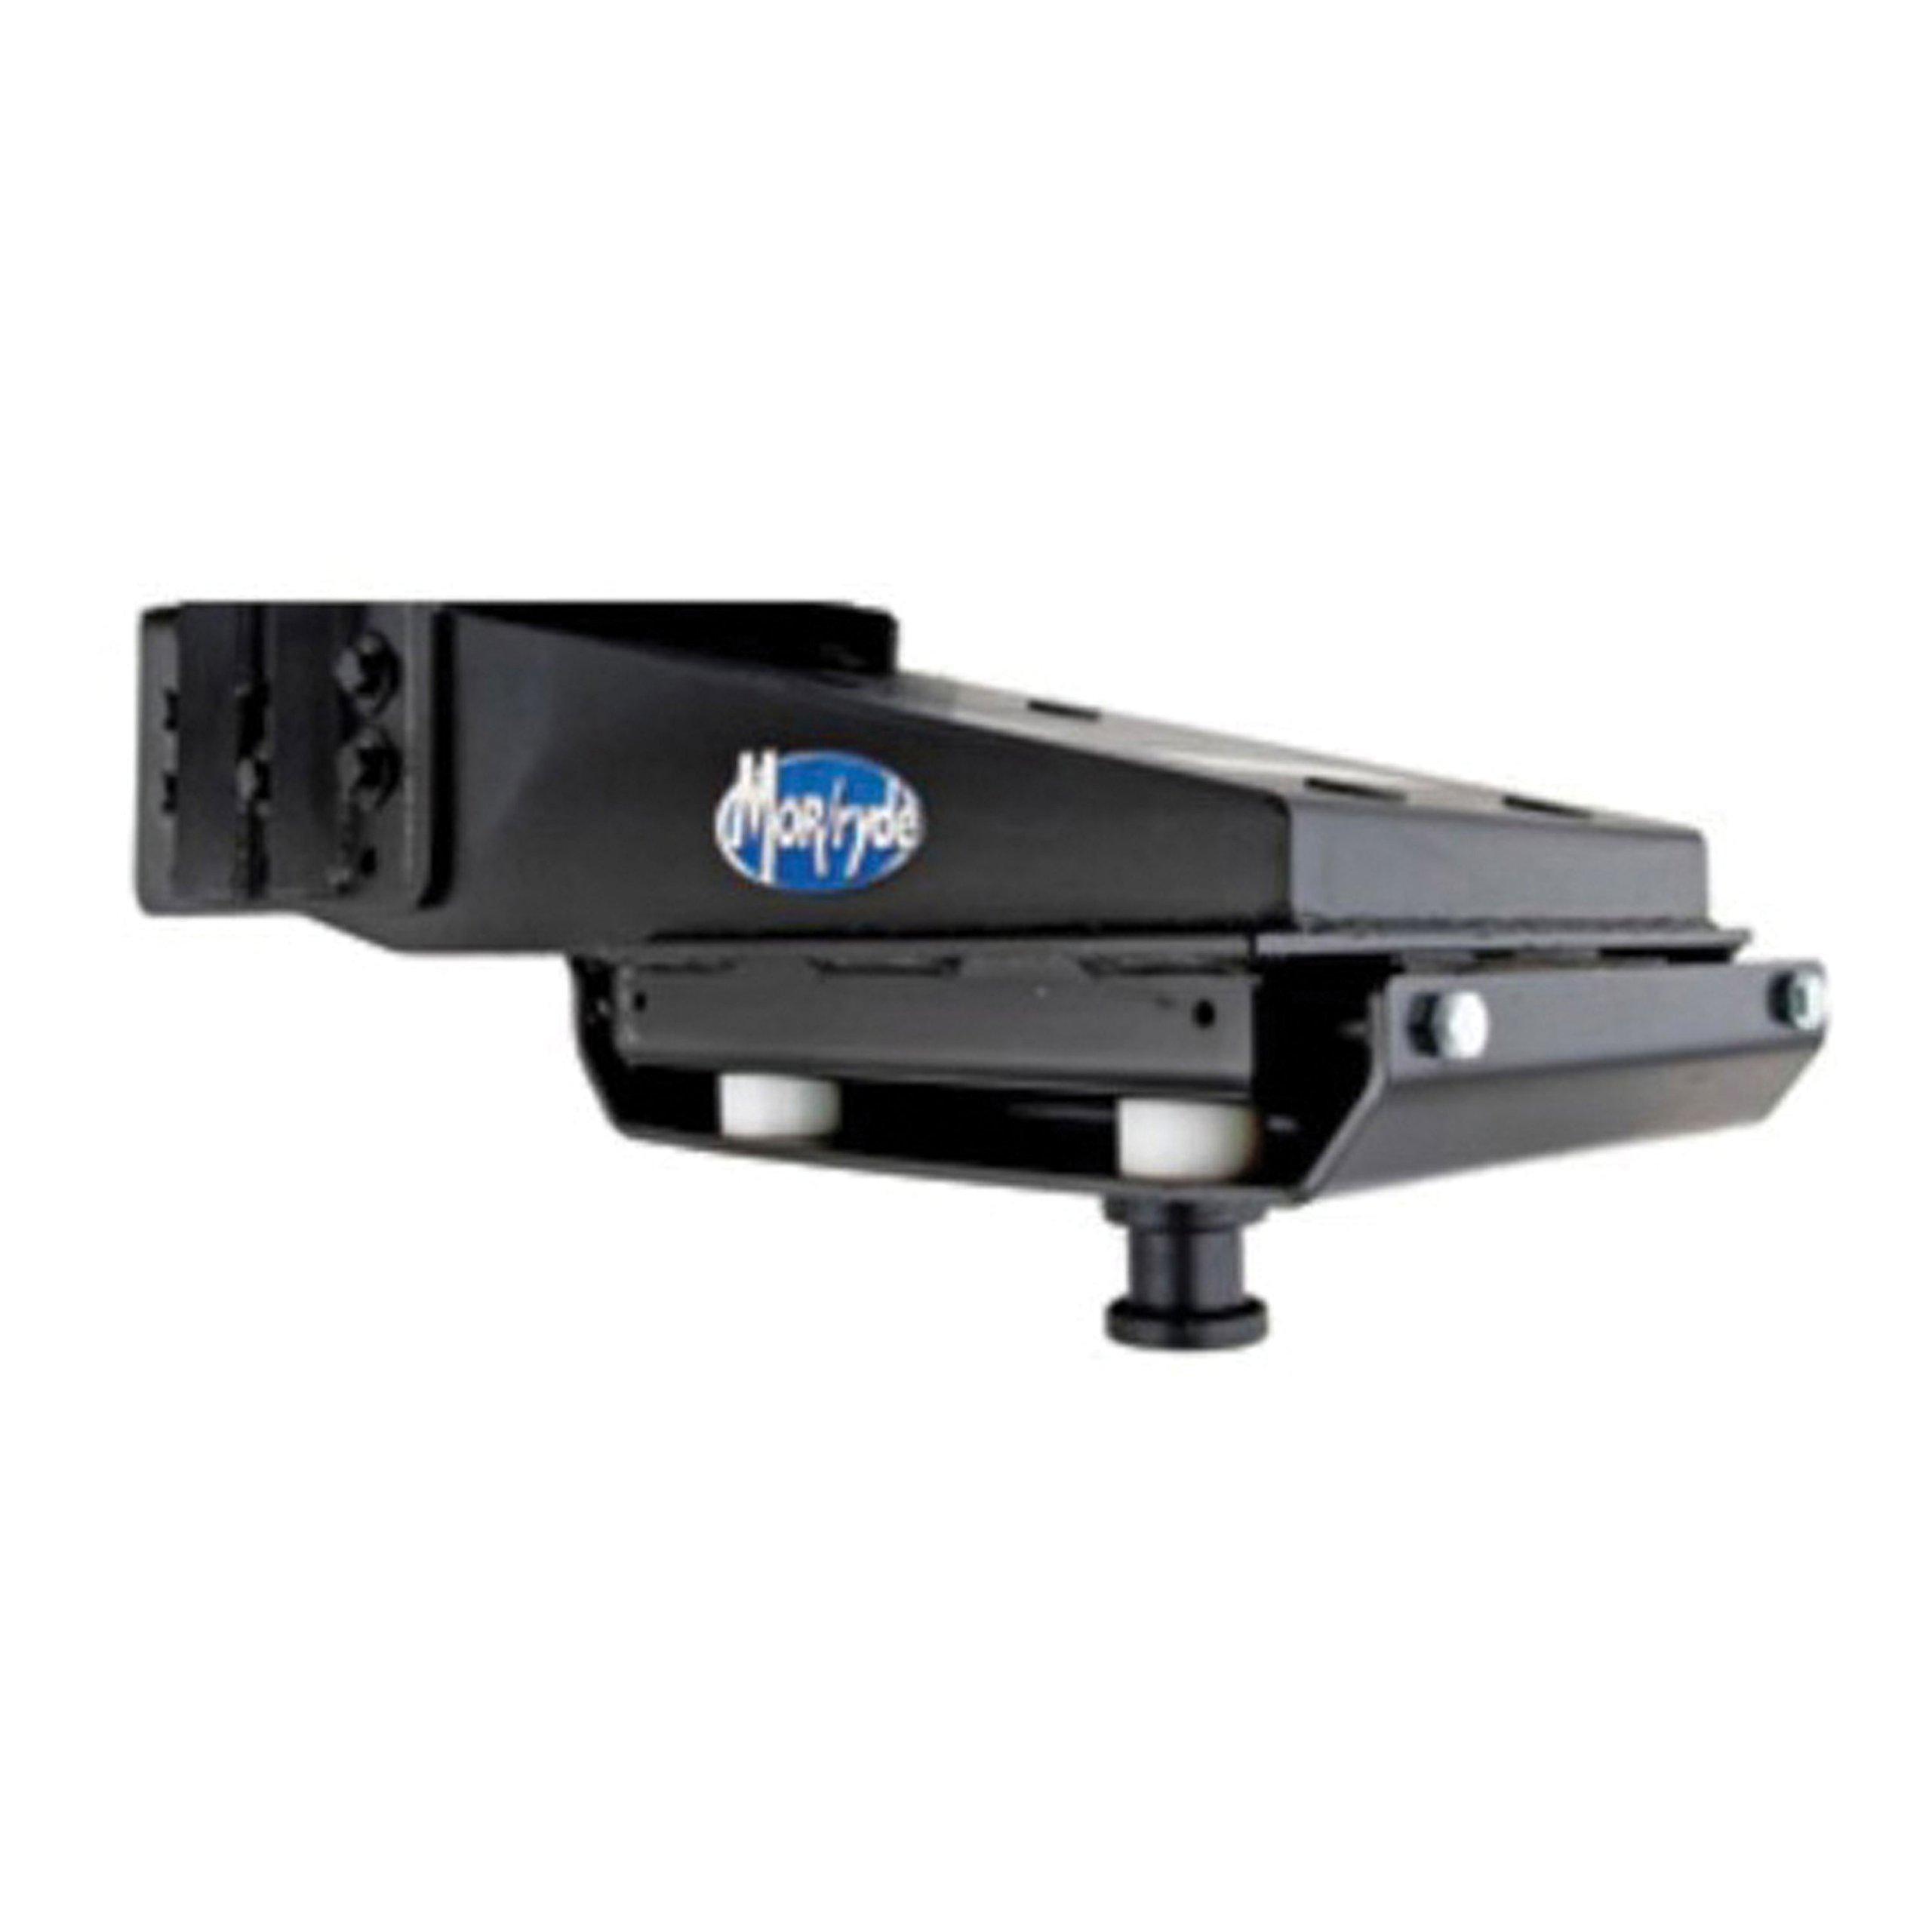 MORryde MORyde RPB72-1621HD-04 Pin Box System, 11.5-14K GVWR - Lippert 1621 HD/SHD by MORryde